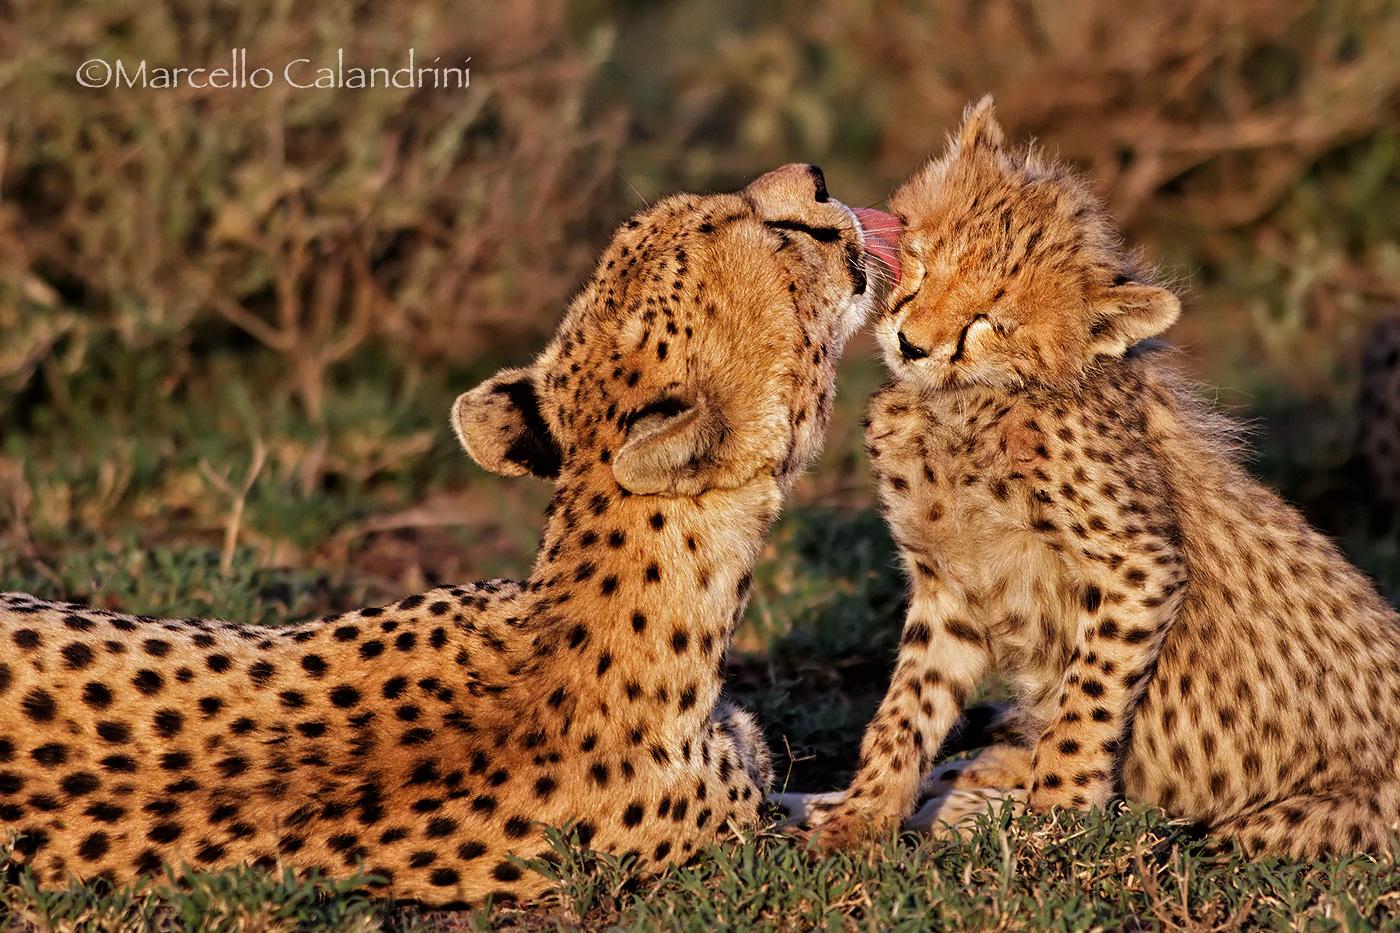 Tenderness...